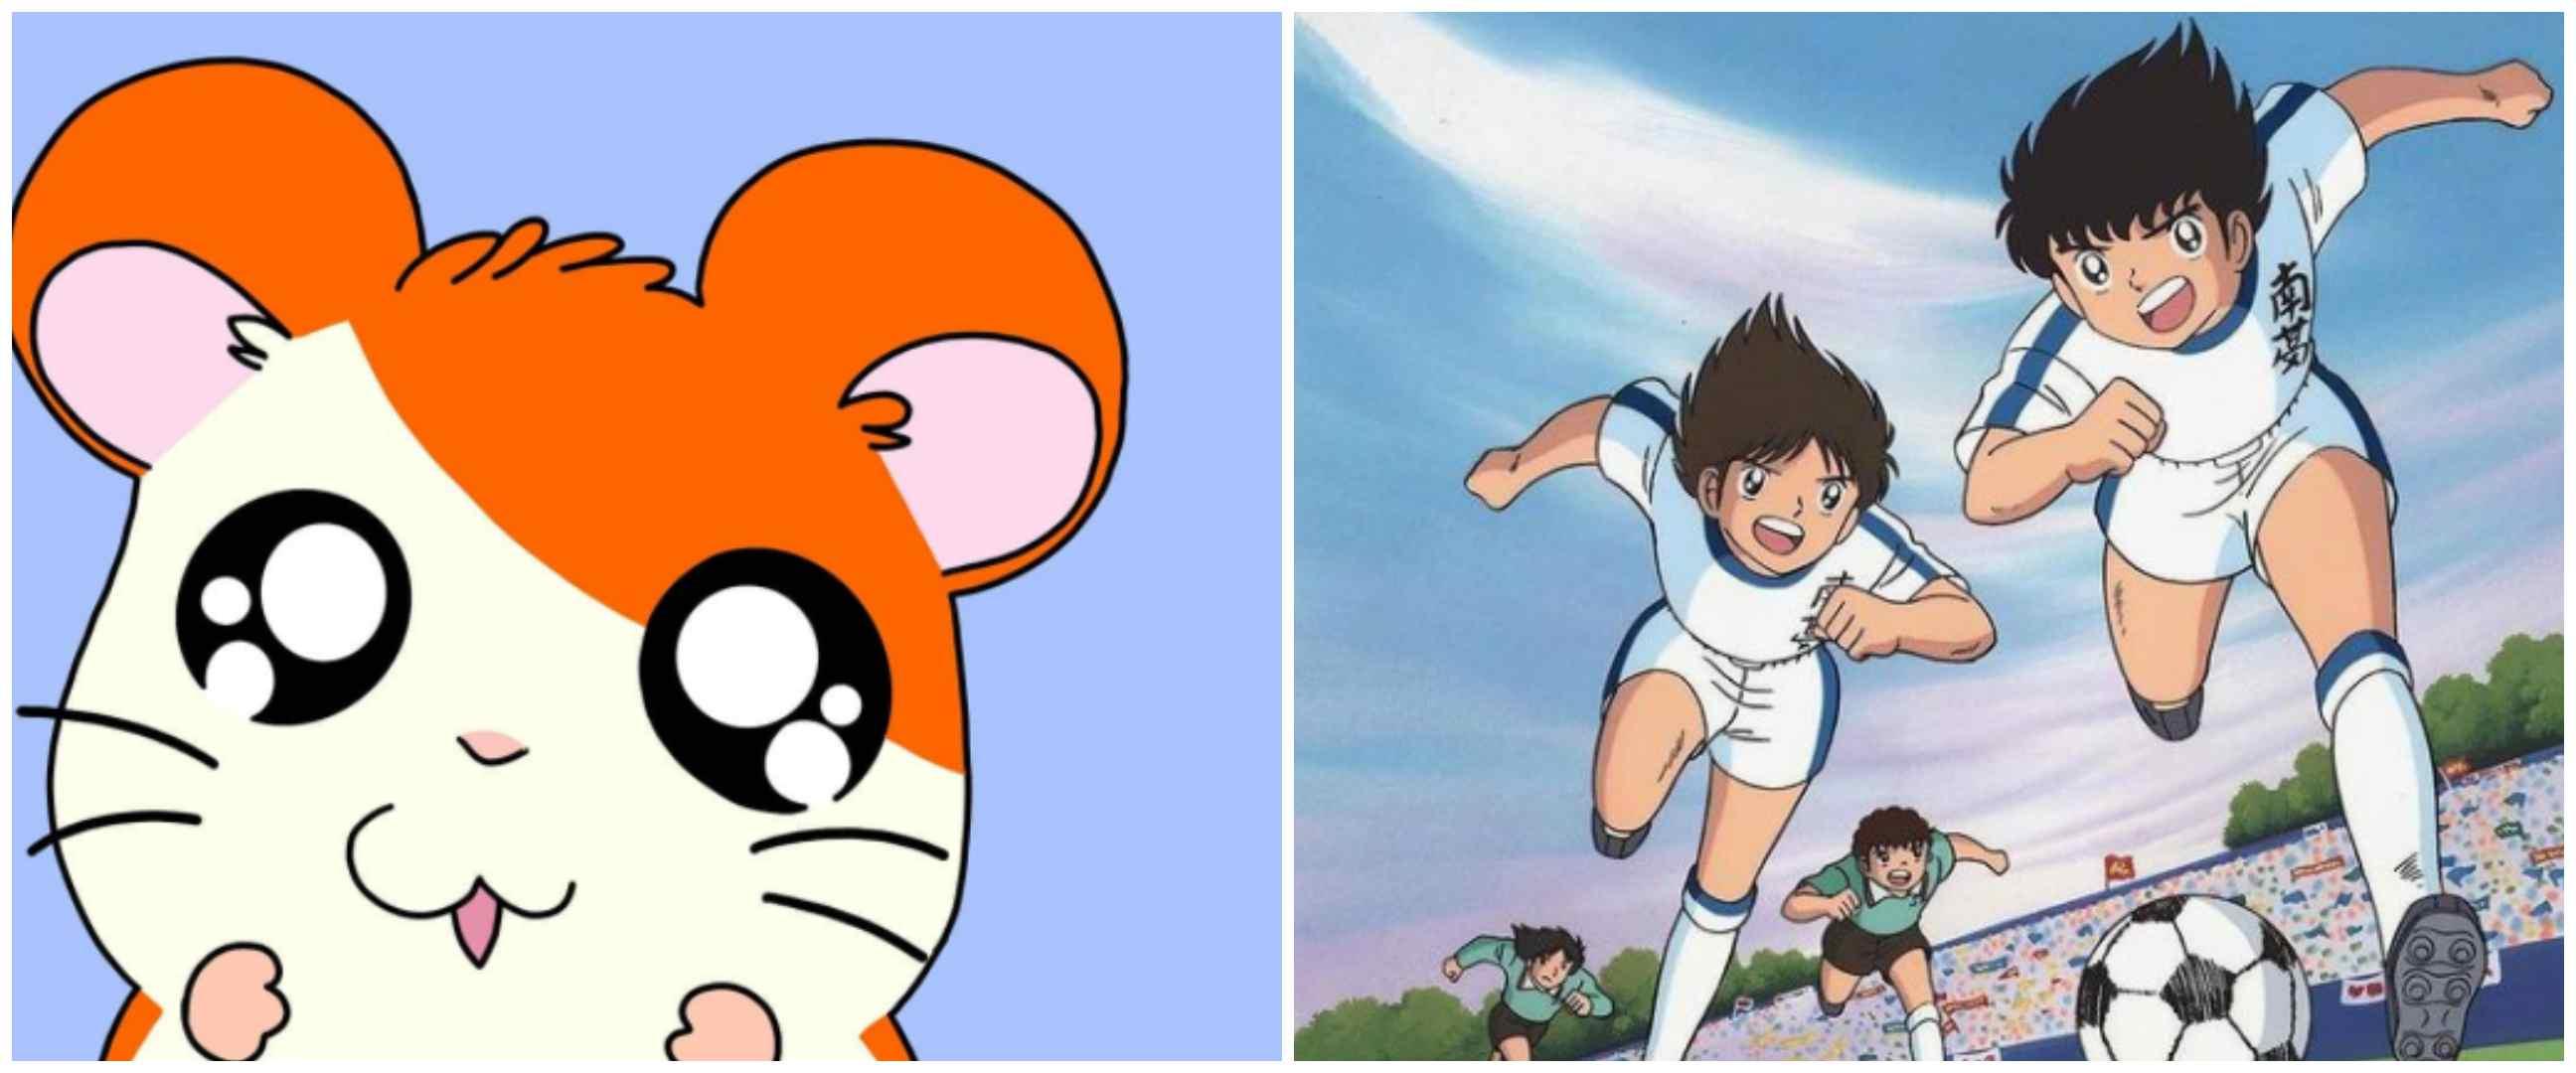 10 Kartun Jepang jadul bikin nostalgia, lagunya lekat di ingatan